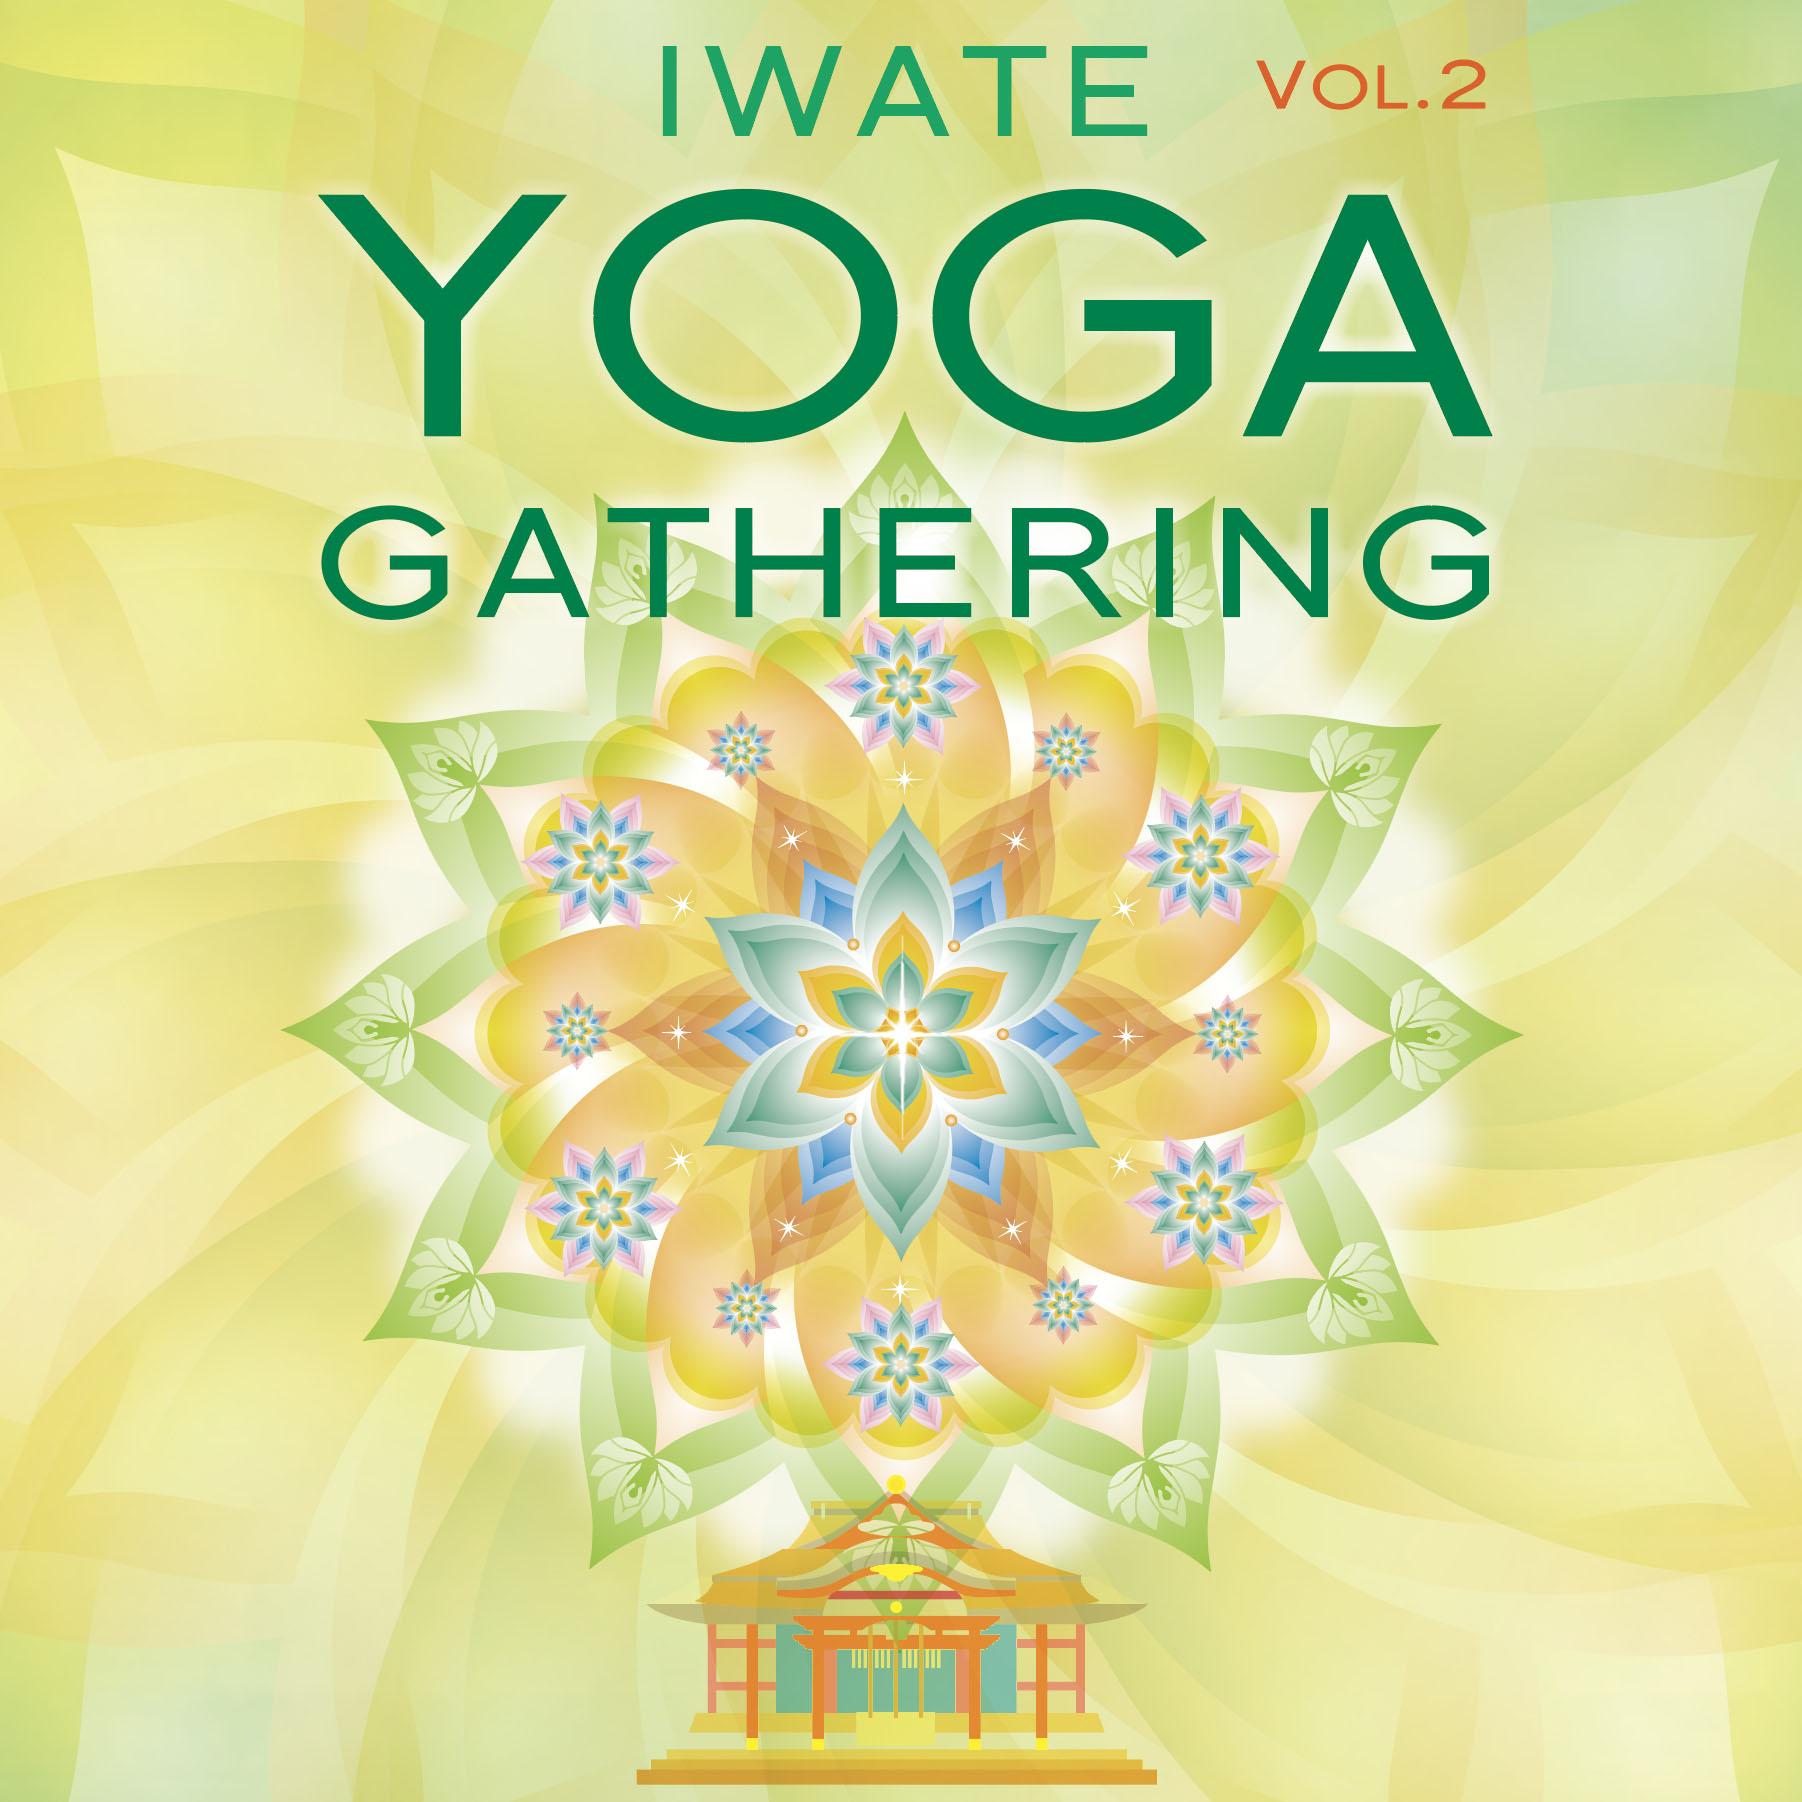 IWATE yoga gathering! vol.2